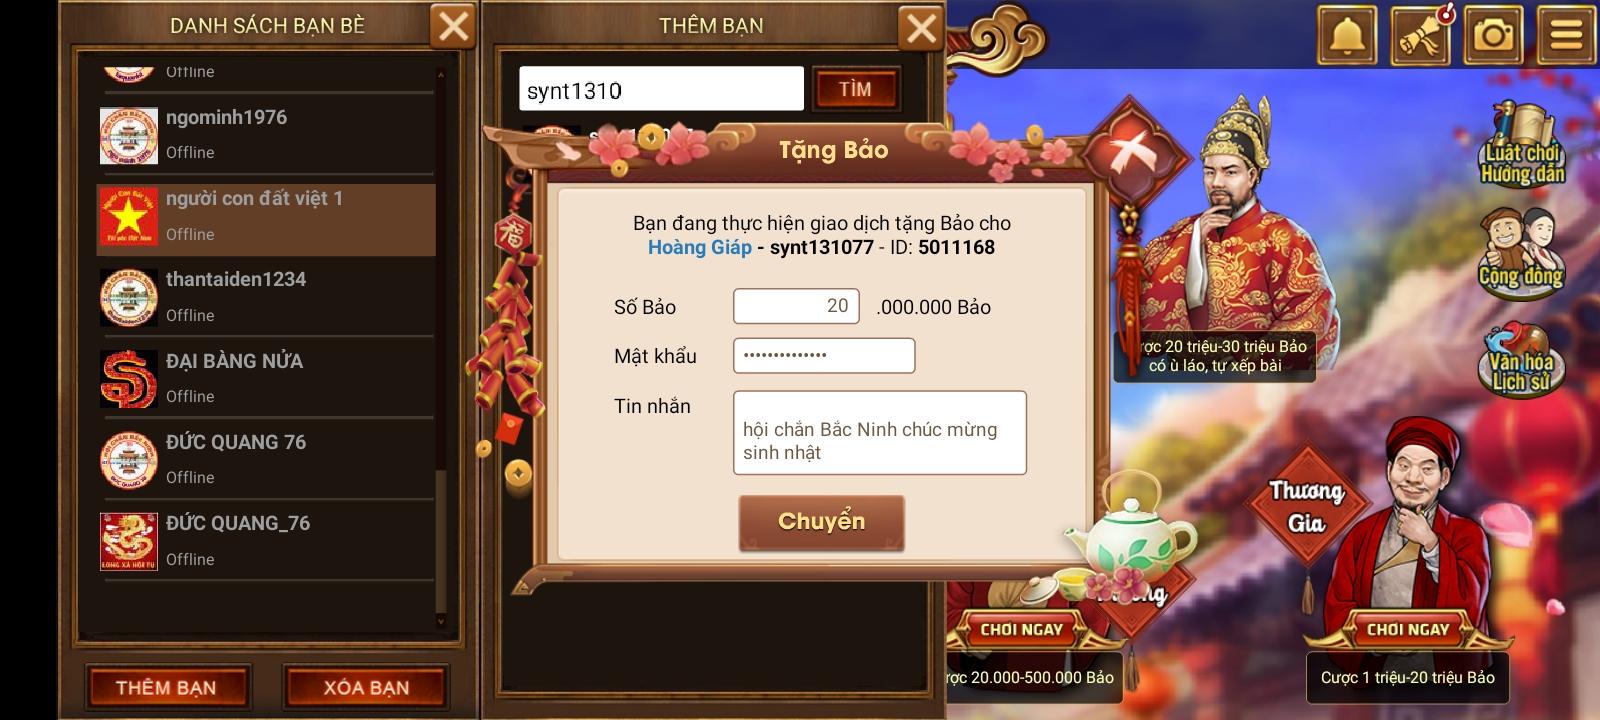 Screenshot_2021-10-13-08-01-46-88_b4a956abfc1254b7faeff91b842ff32d.